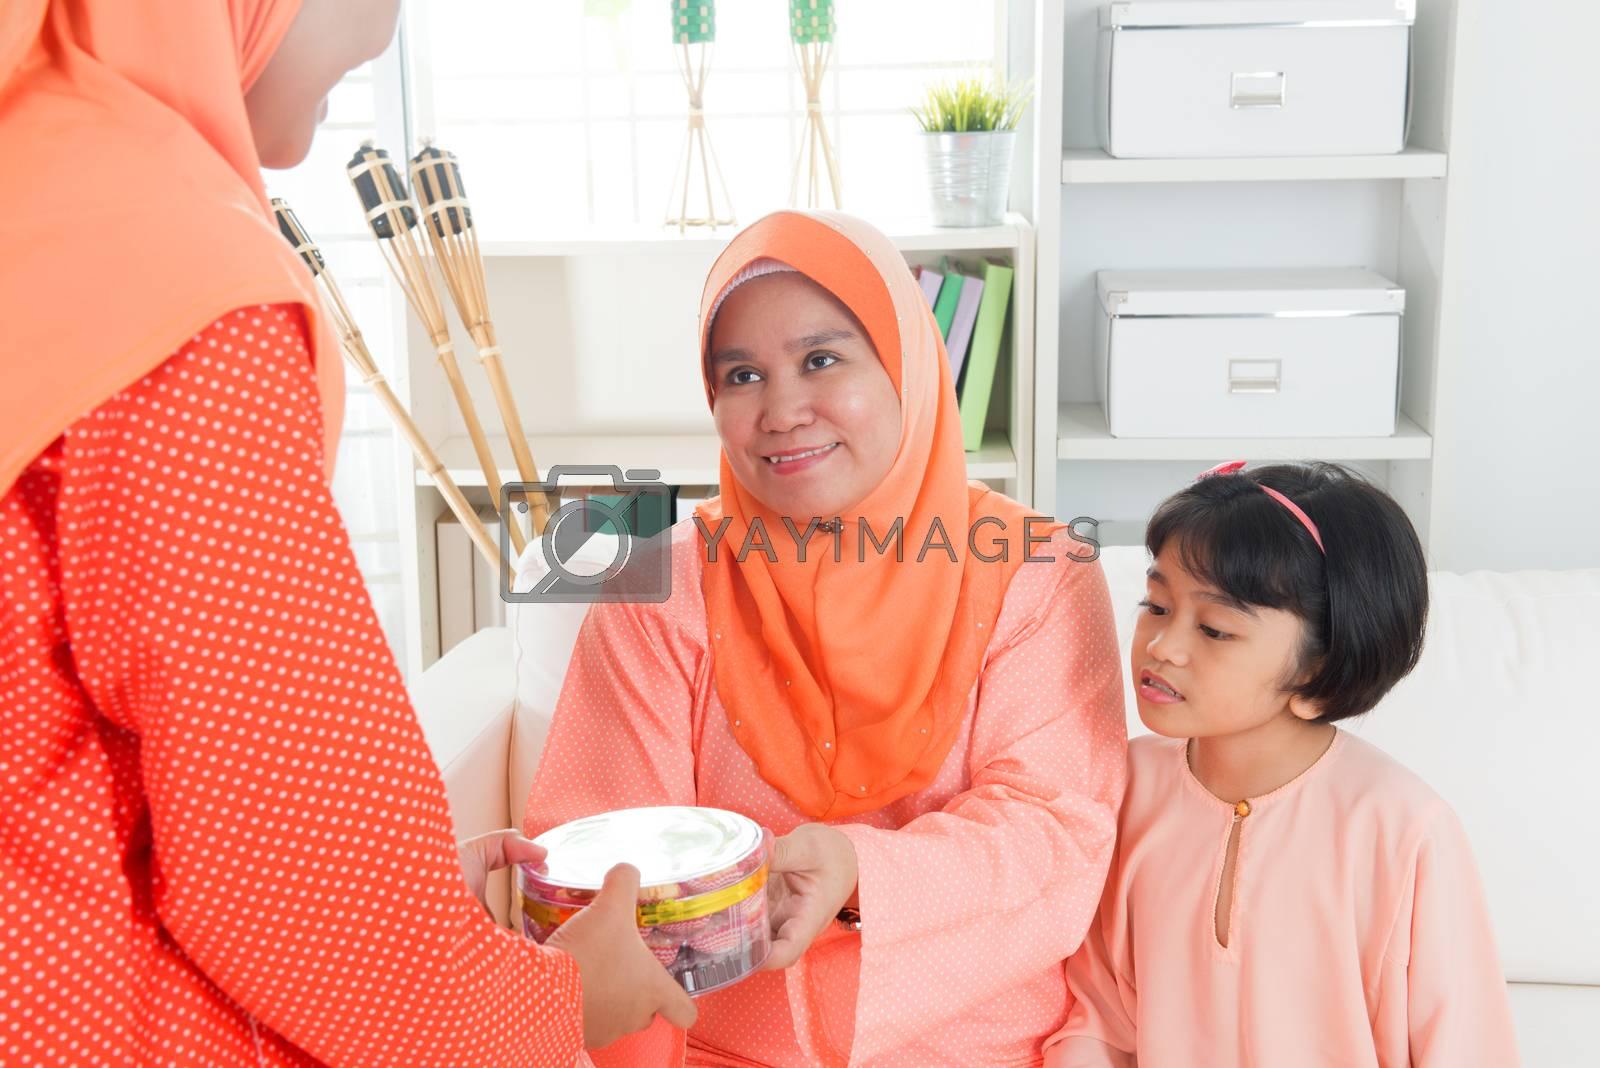 Woman giving elder cookies during Hari Raya. Malay or Malaysian family lifestyle at home.